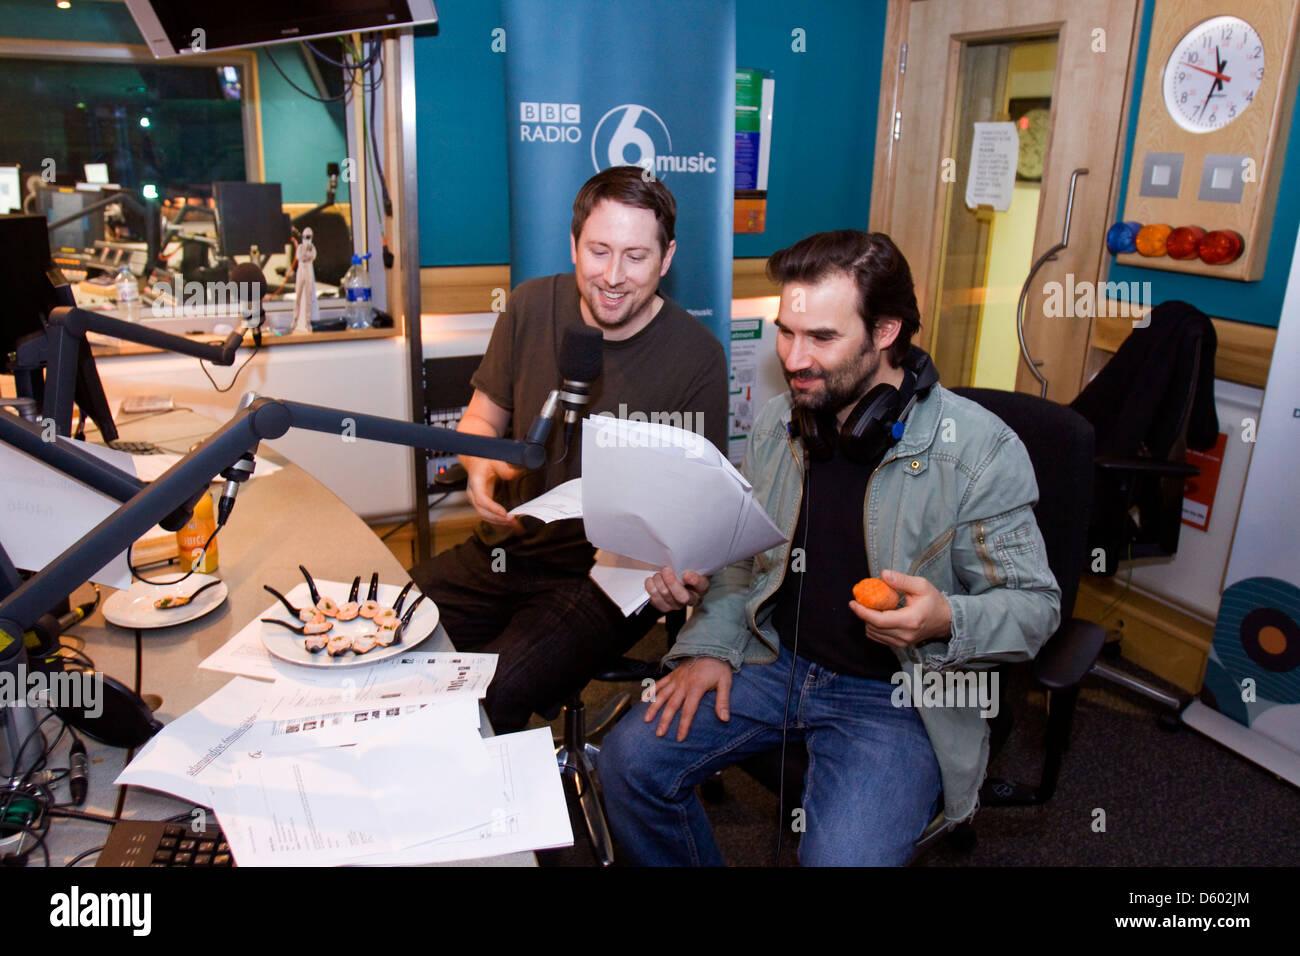 Adam Buxton and Joe Cornish, English comedians from the Adam and Joe radio show at BBC 6 Music, London, England. Stock Photo